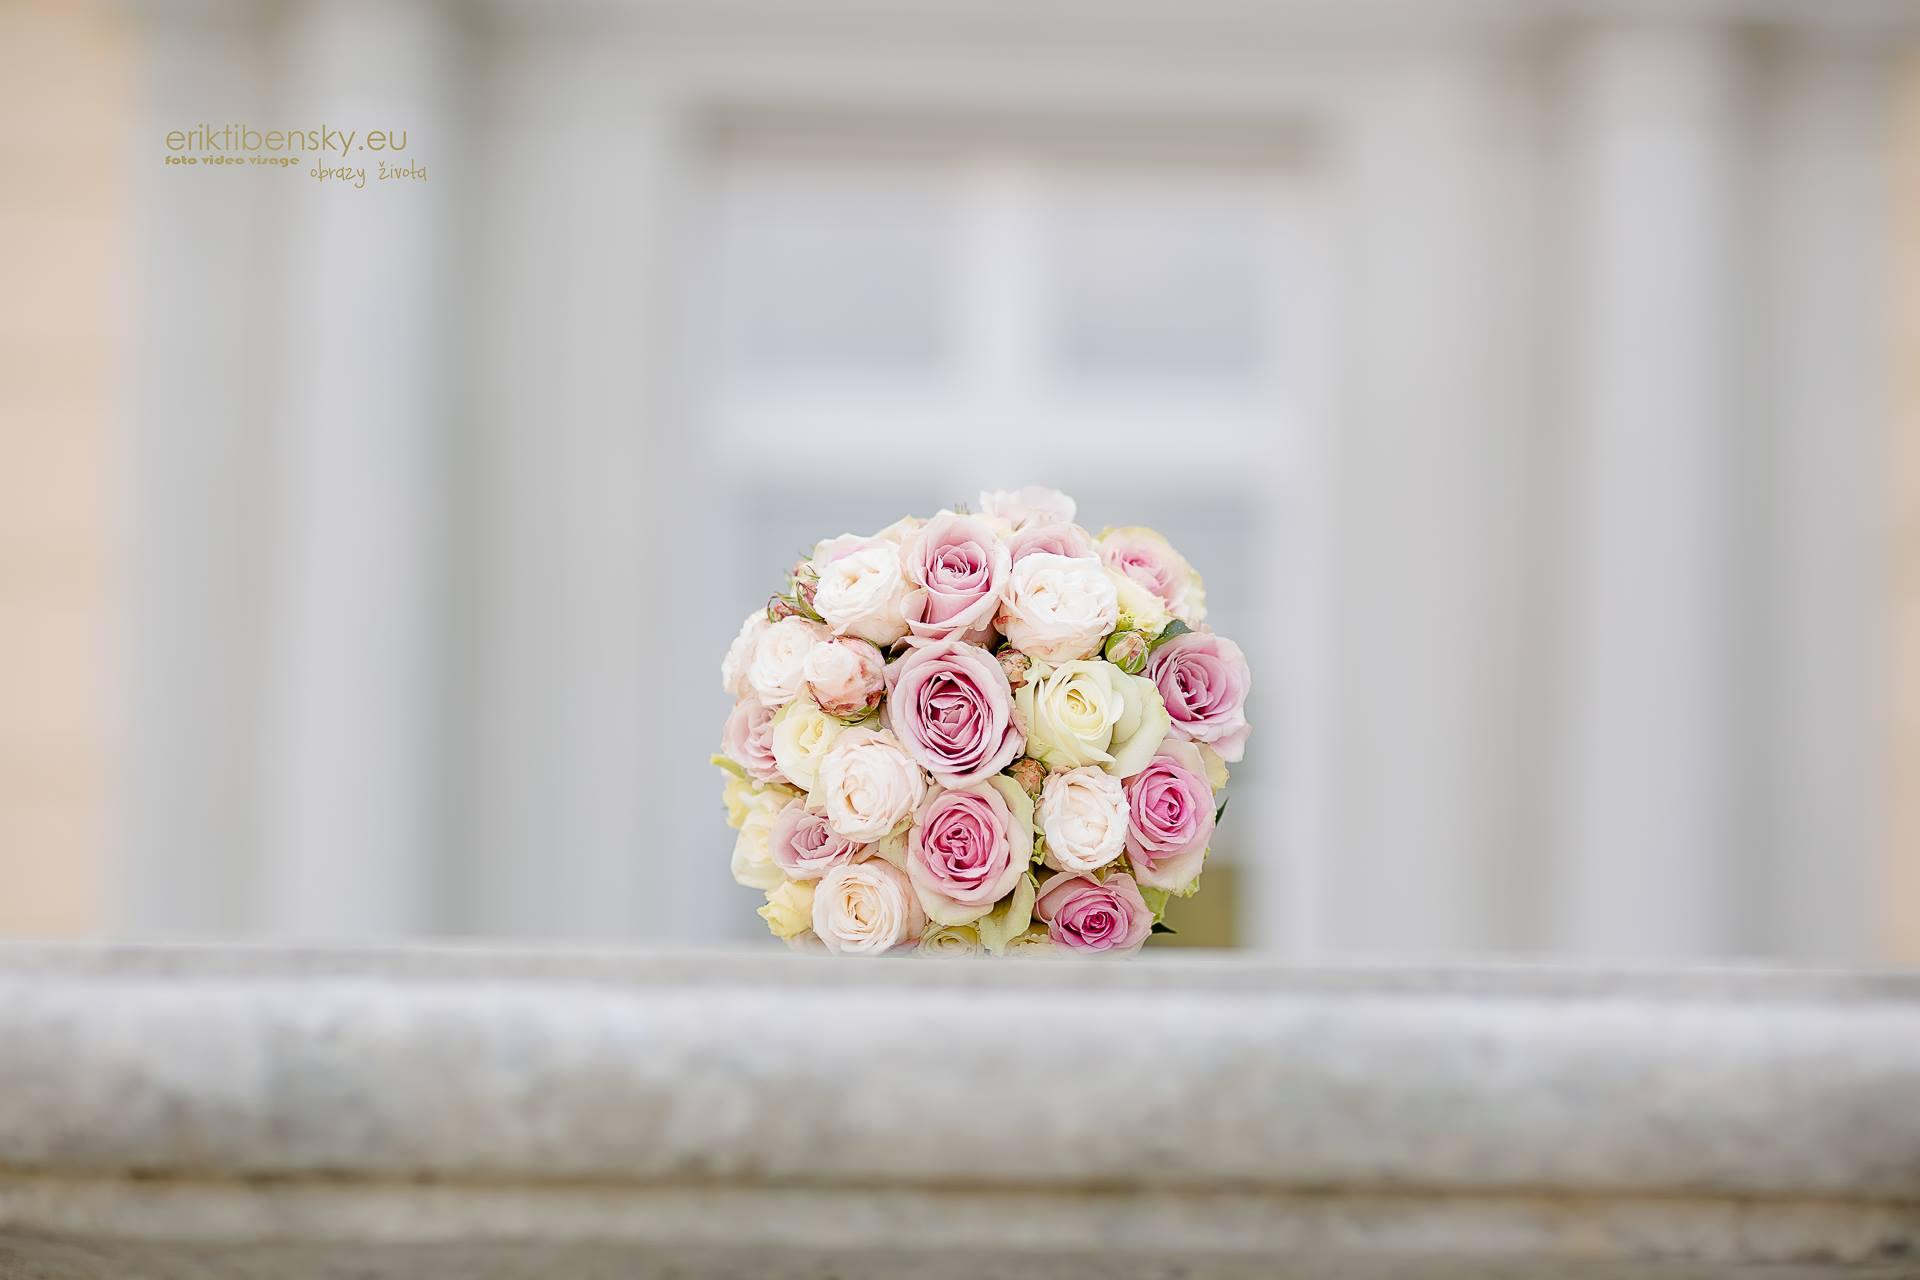 eriktibensky-eu-svadobny-fotograf-wedding-photographer-3071